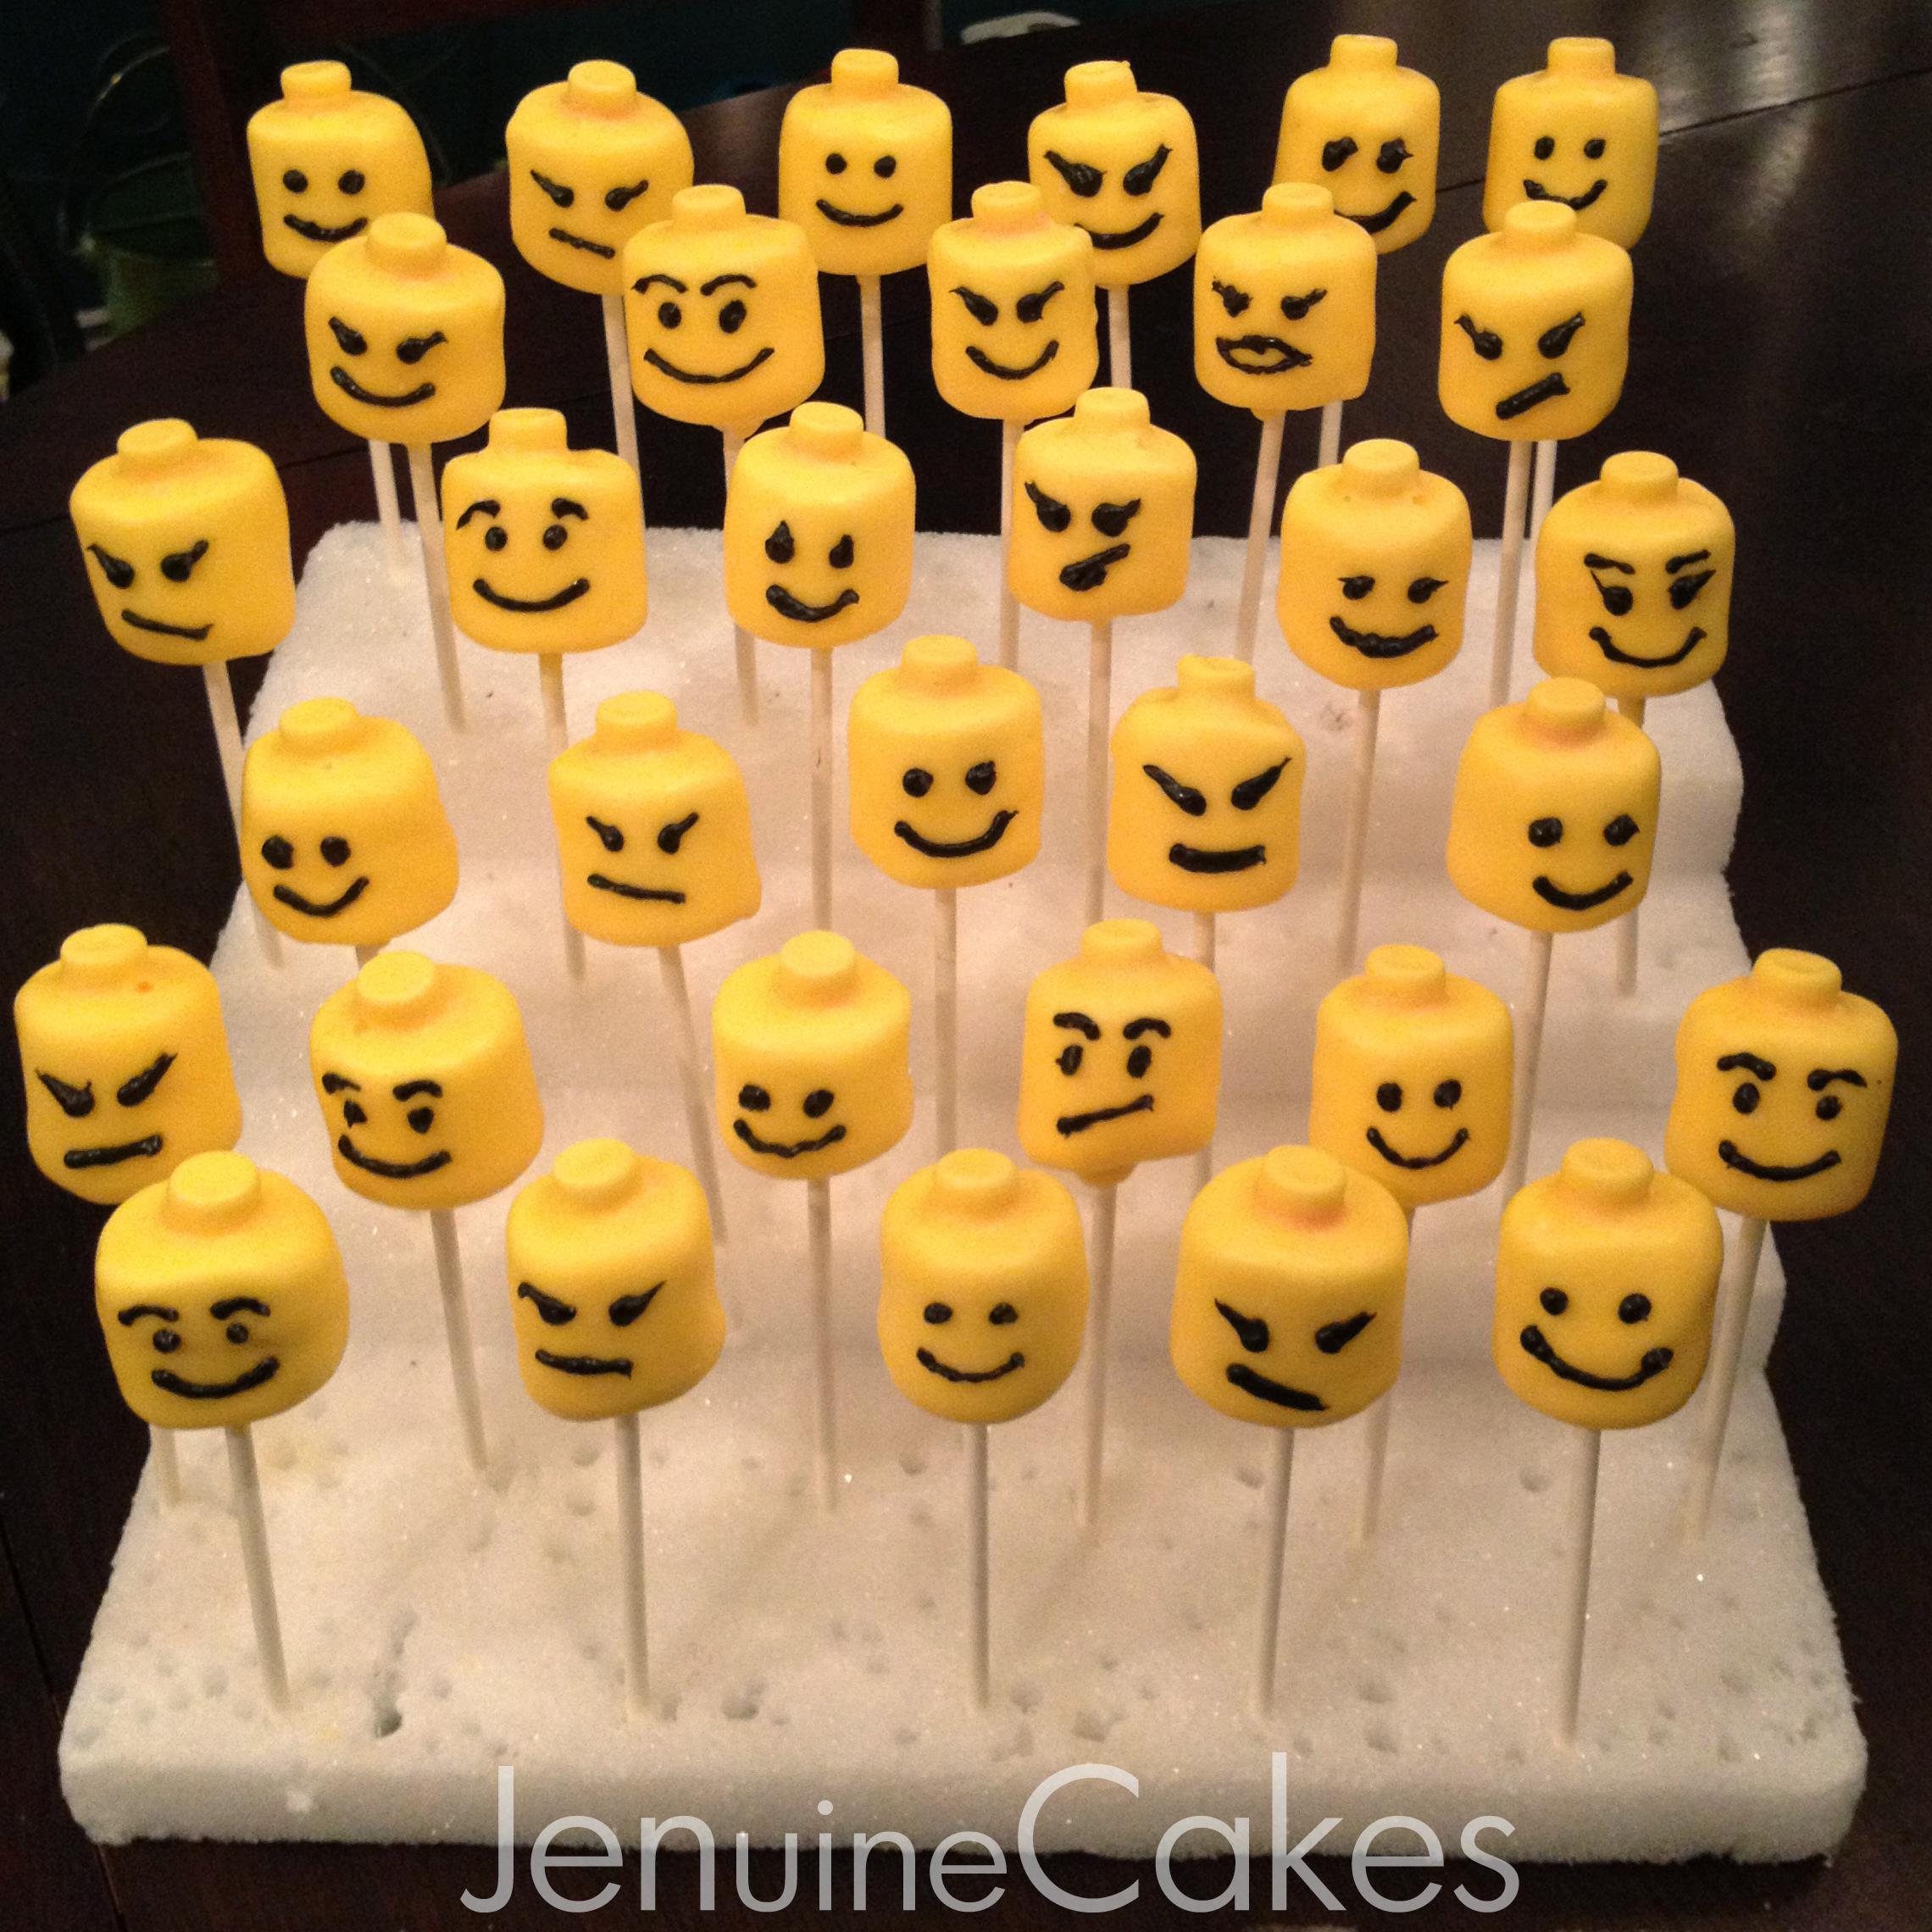 0 Lego Marshmallow Pops 1